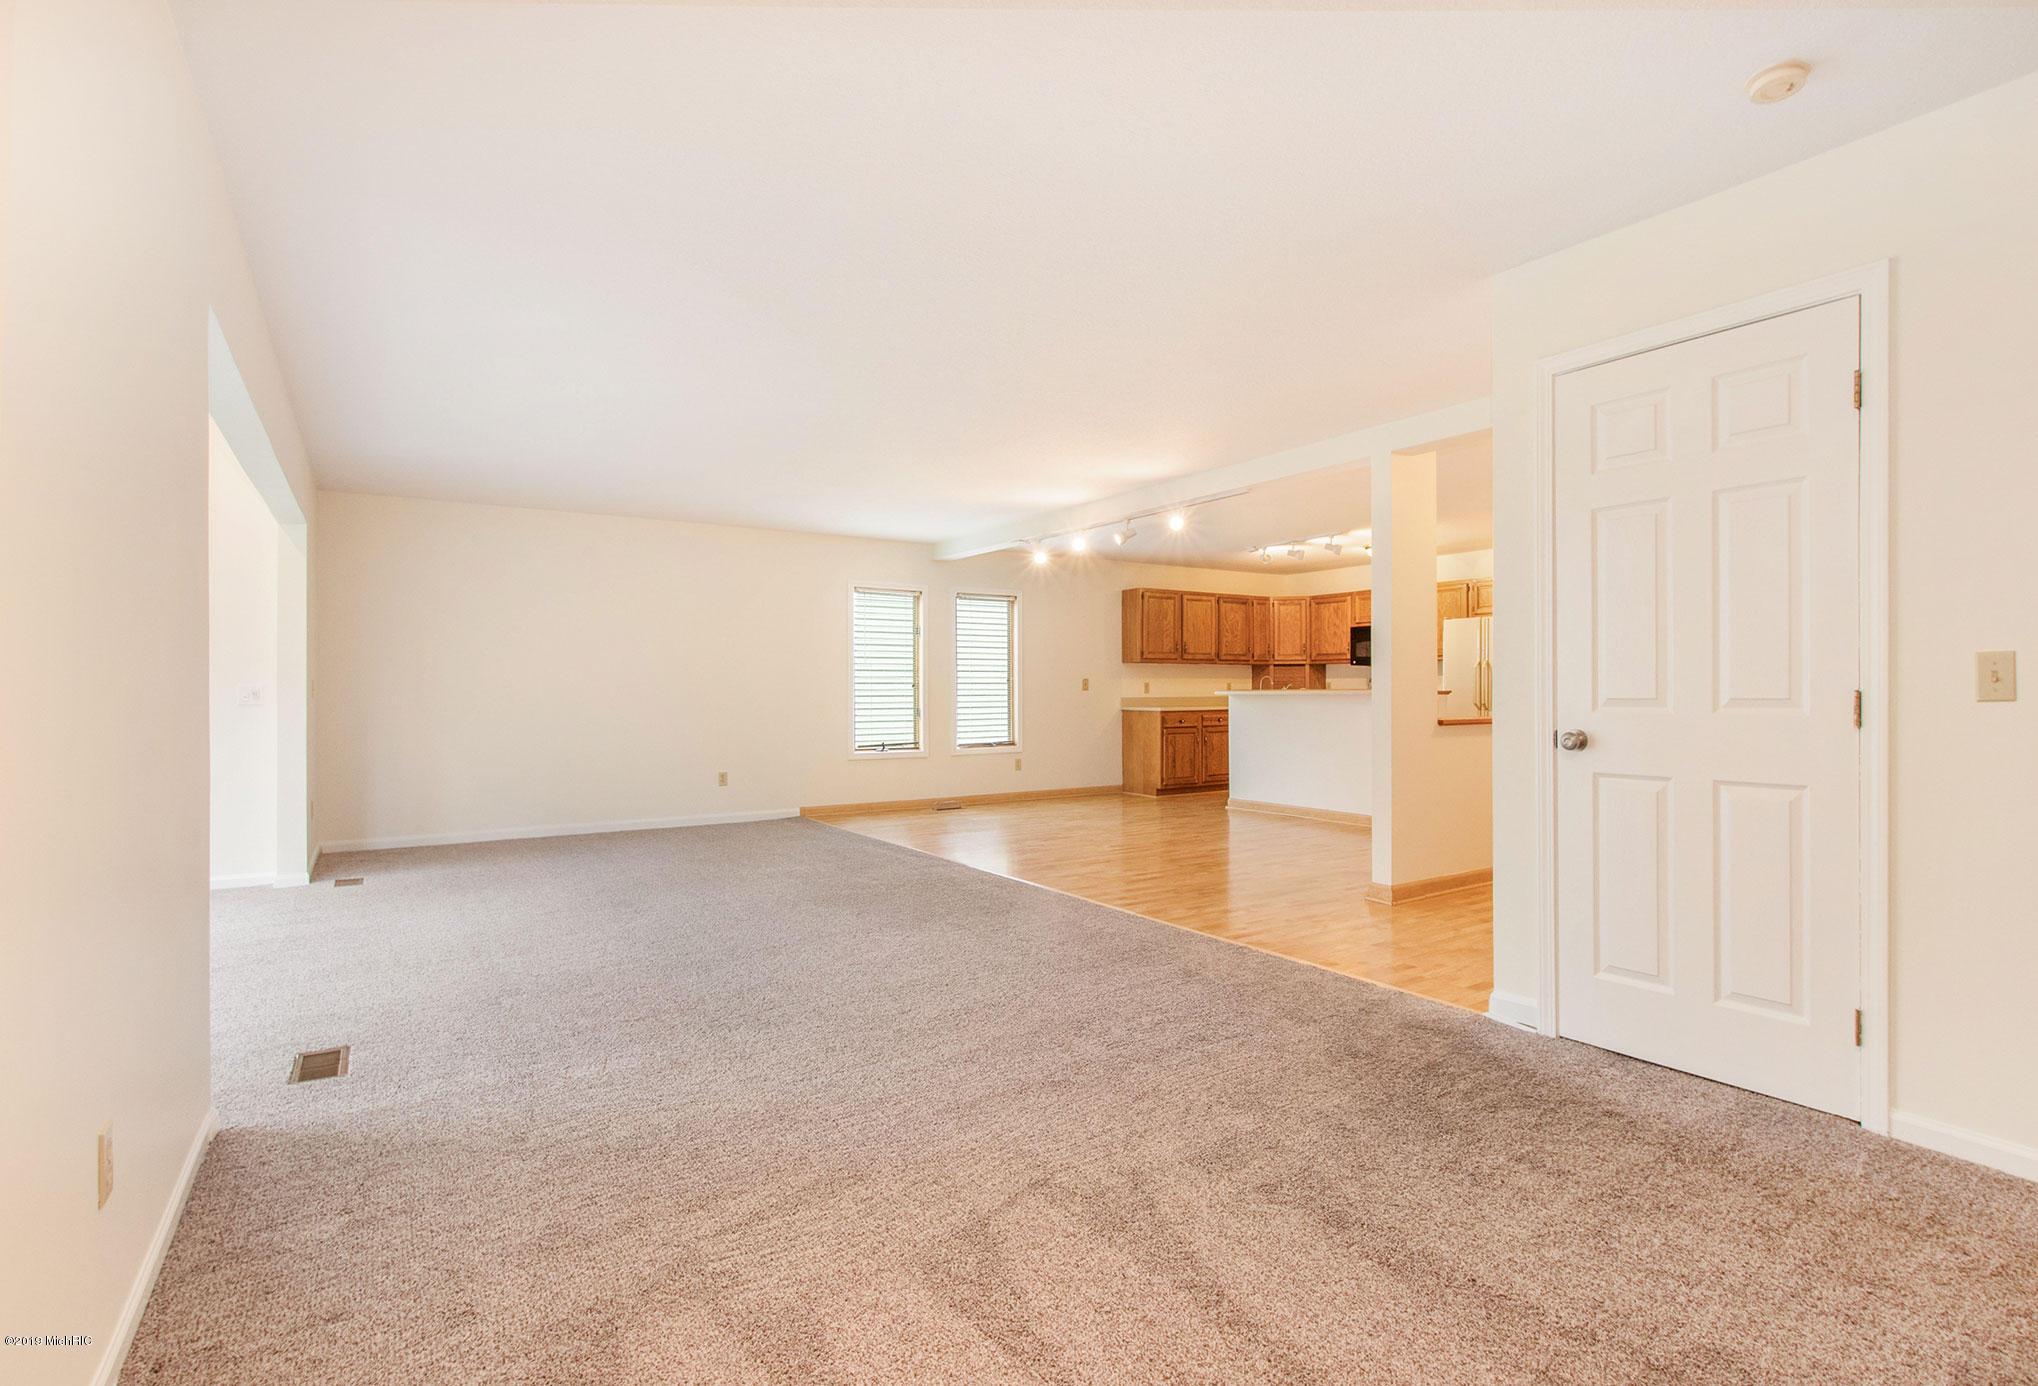 Huge living area on main floor